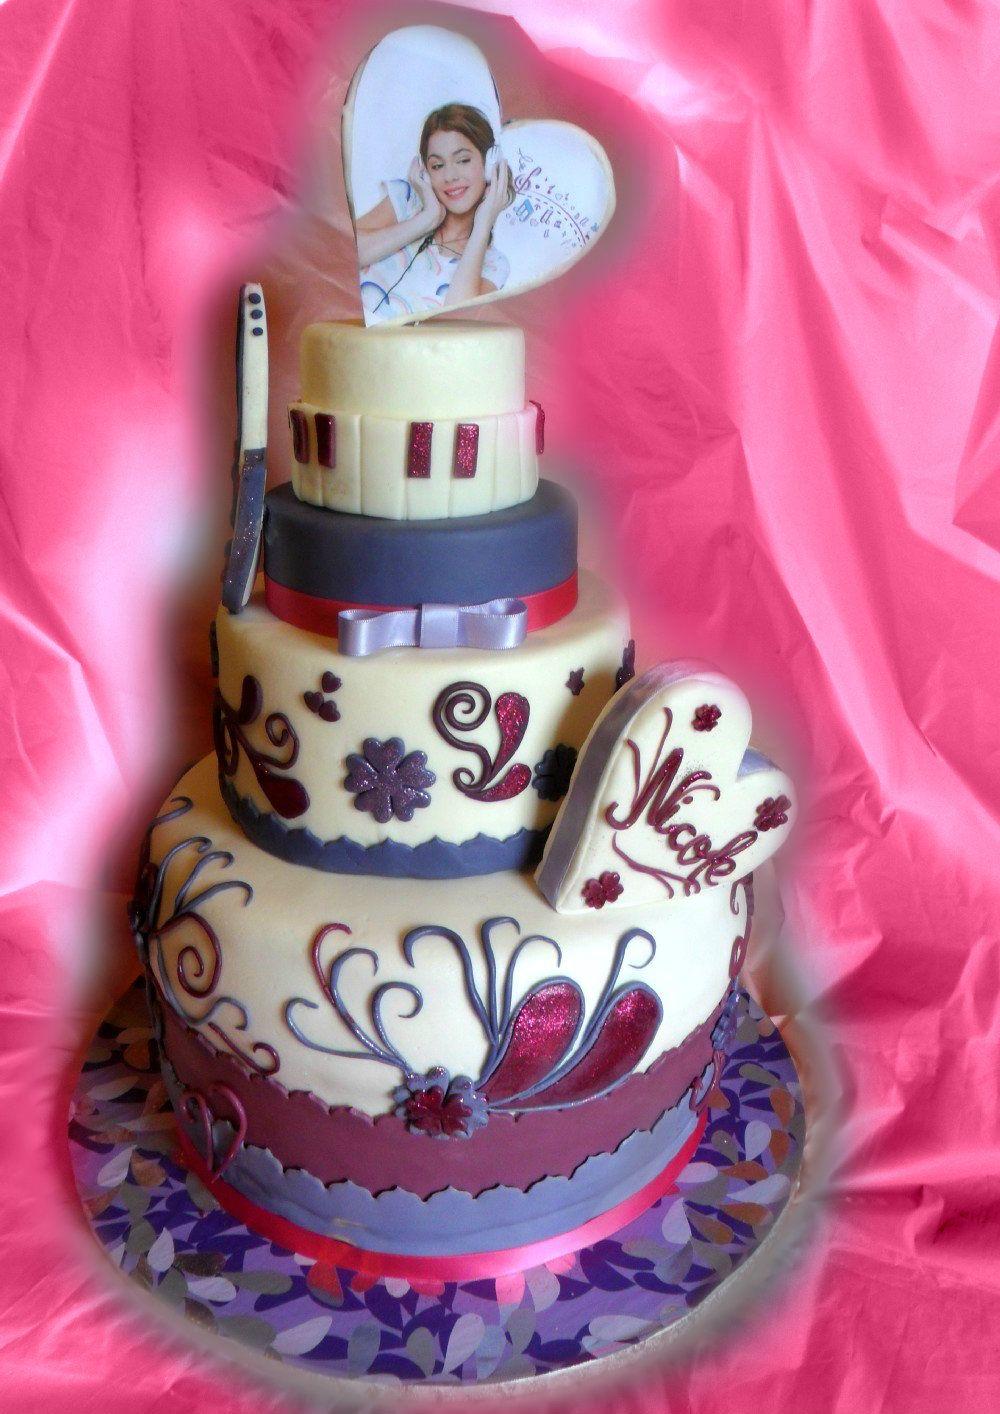 Torta Compleanno Violetta.Torta Violetta In Pasta Di Zucchero Torte Pasta Di Zucchero E